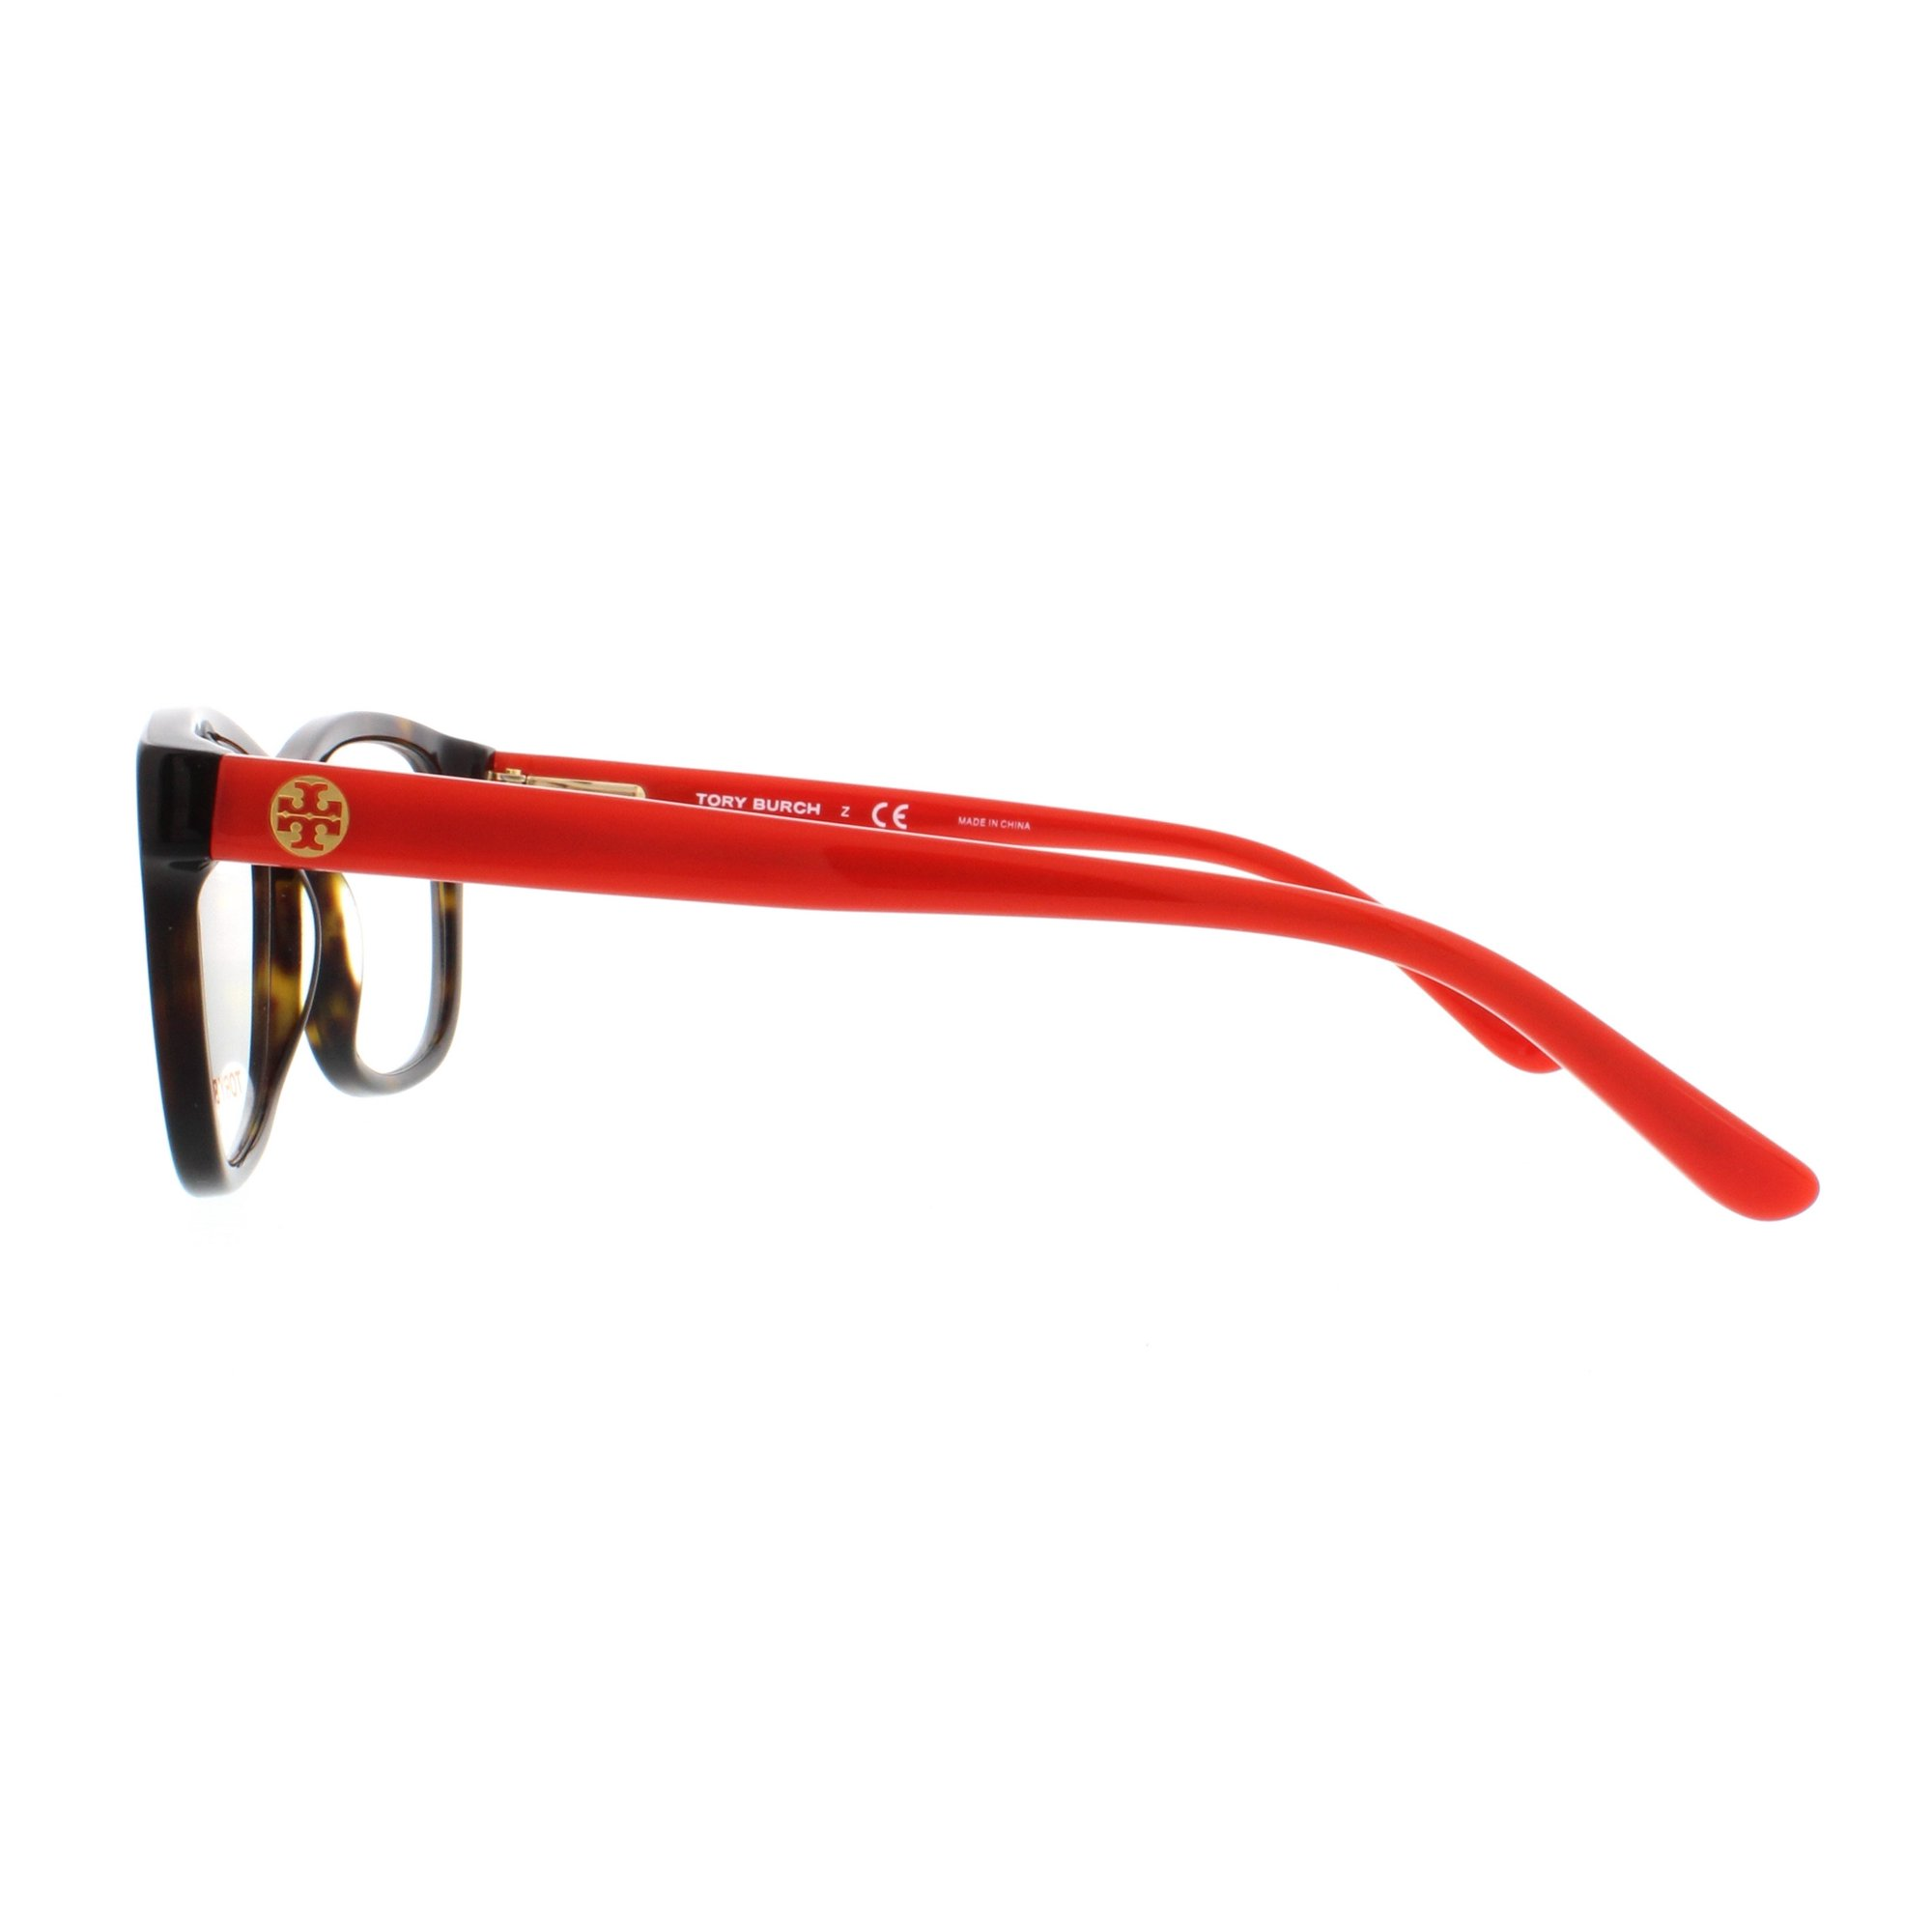 f059b6c036 Buy TORY BURCH Eyeglasses TY 2038 1213 Tortoise Pink 52MM